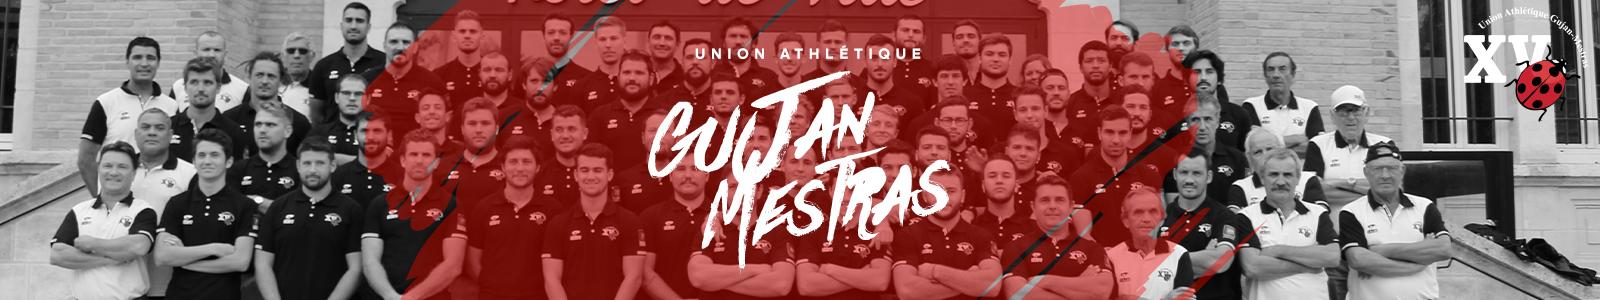 Union Athlétique GUJAN-MESTRAS Rugby : site officiel du club de rugby de GUJAN MESTRAS - clubeo